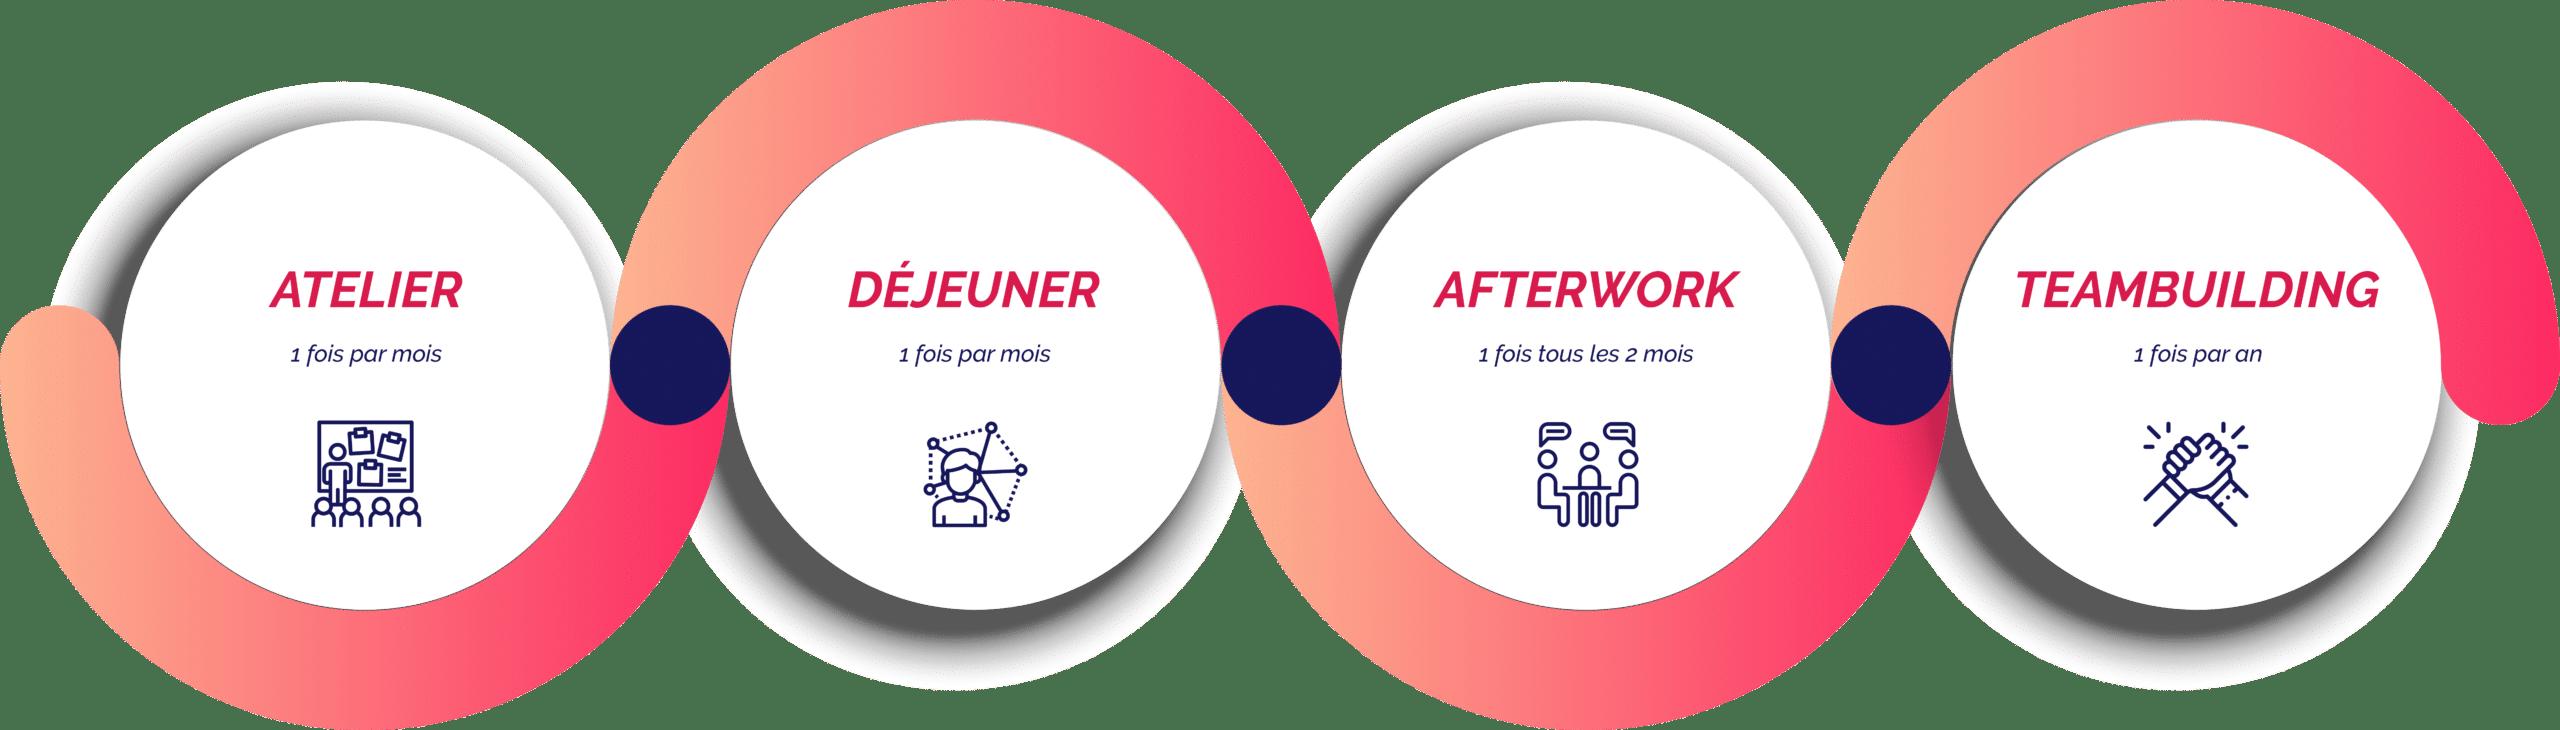 Atelier-Déjeuner-Afterwork-Teambuilding